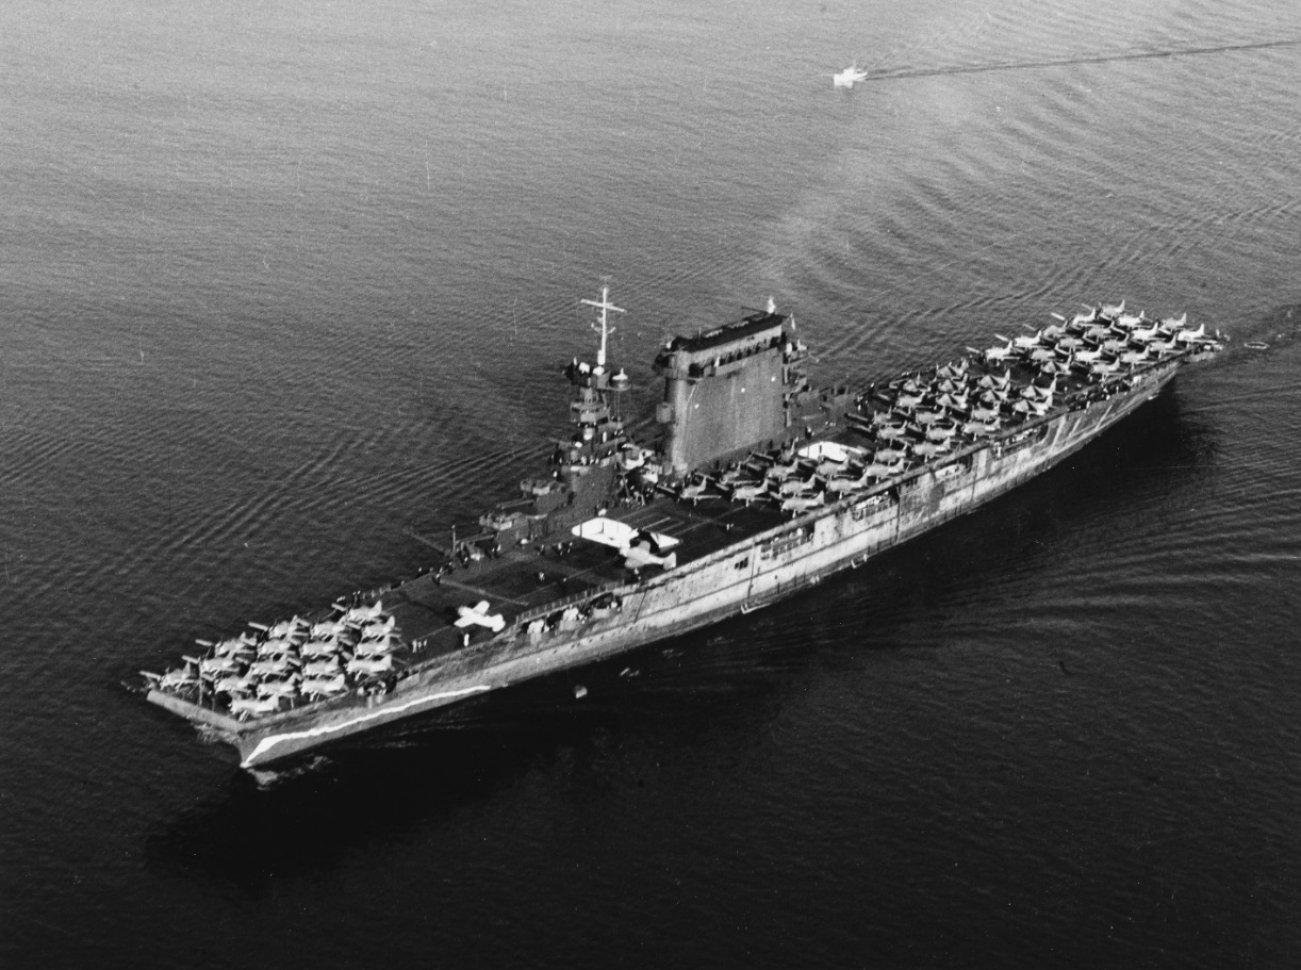 By Sacrificing an Aircraft Carrier at Coral Sea, America Won World War II?